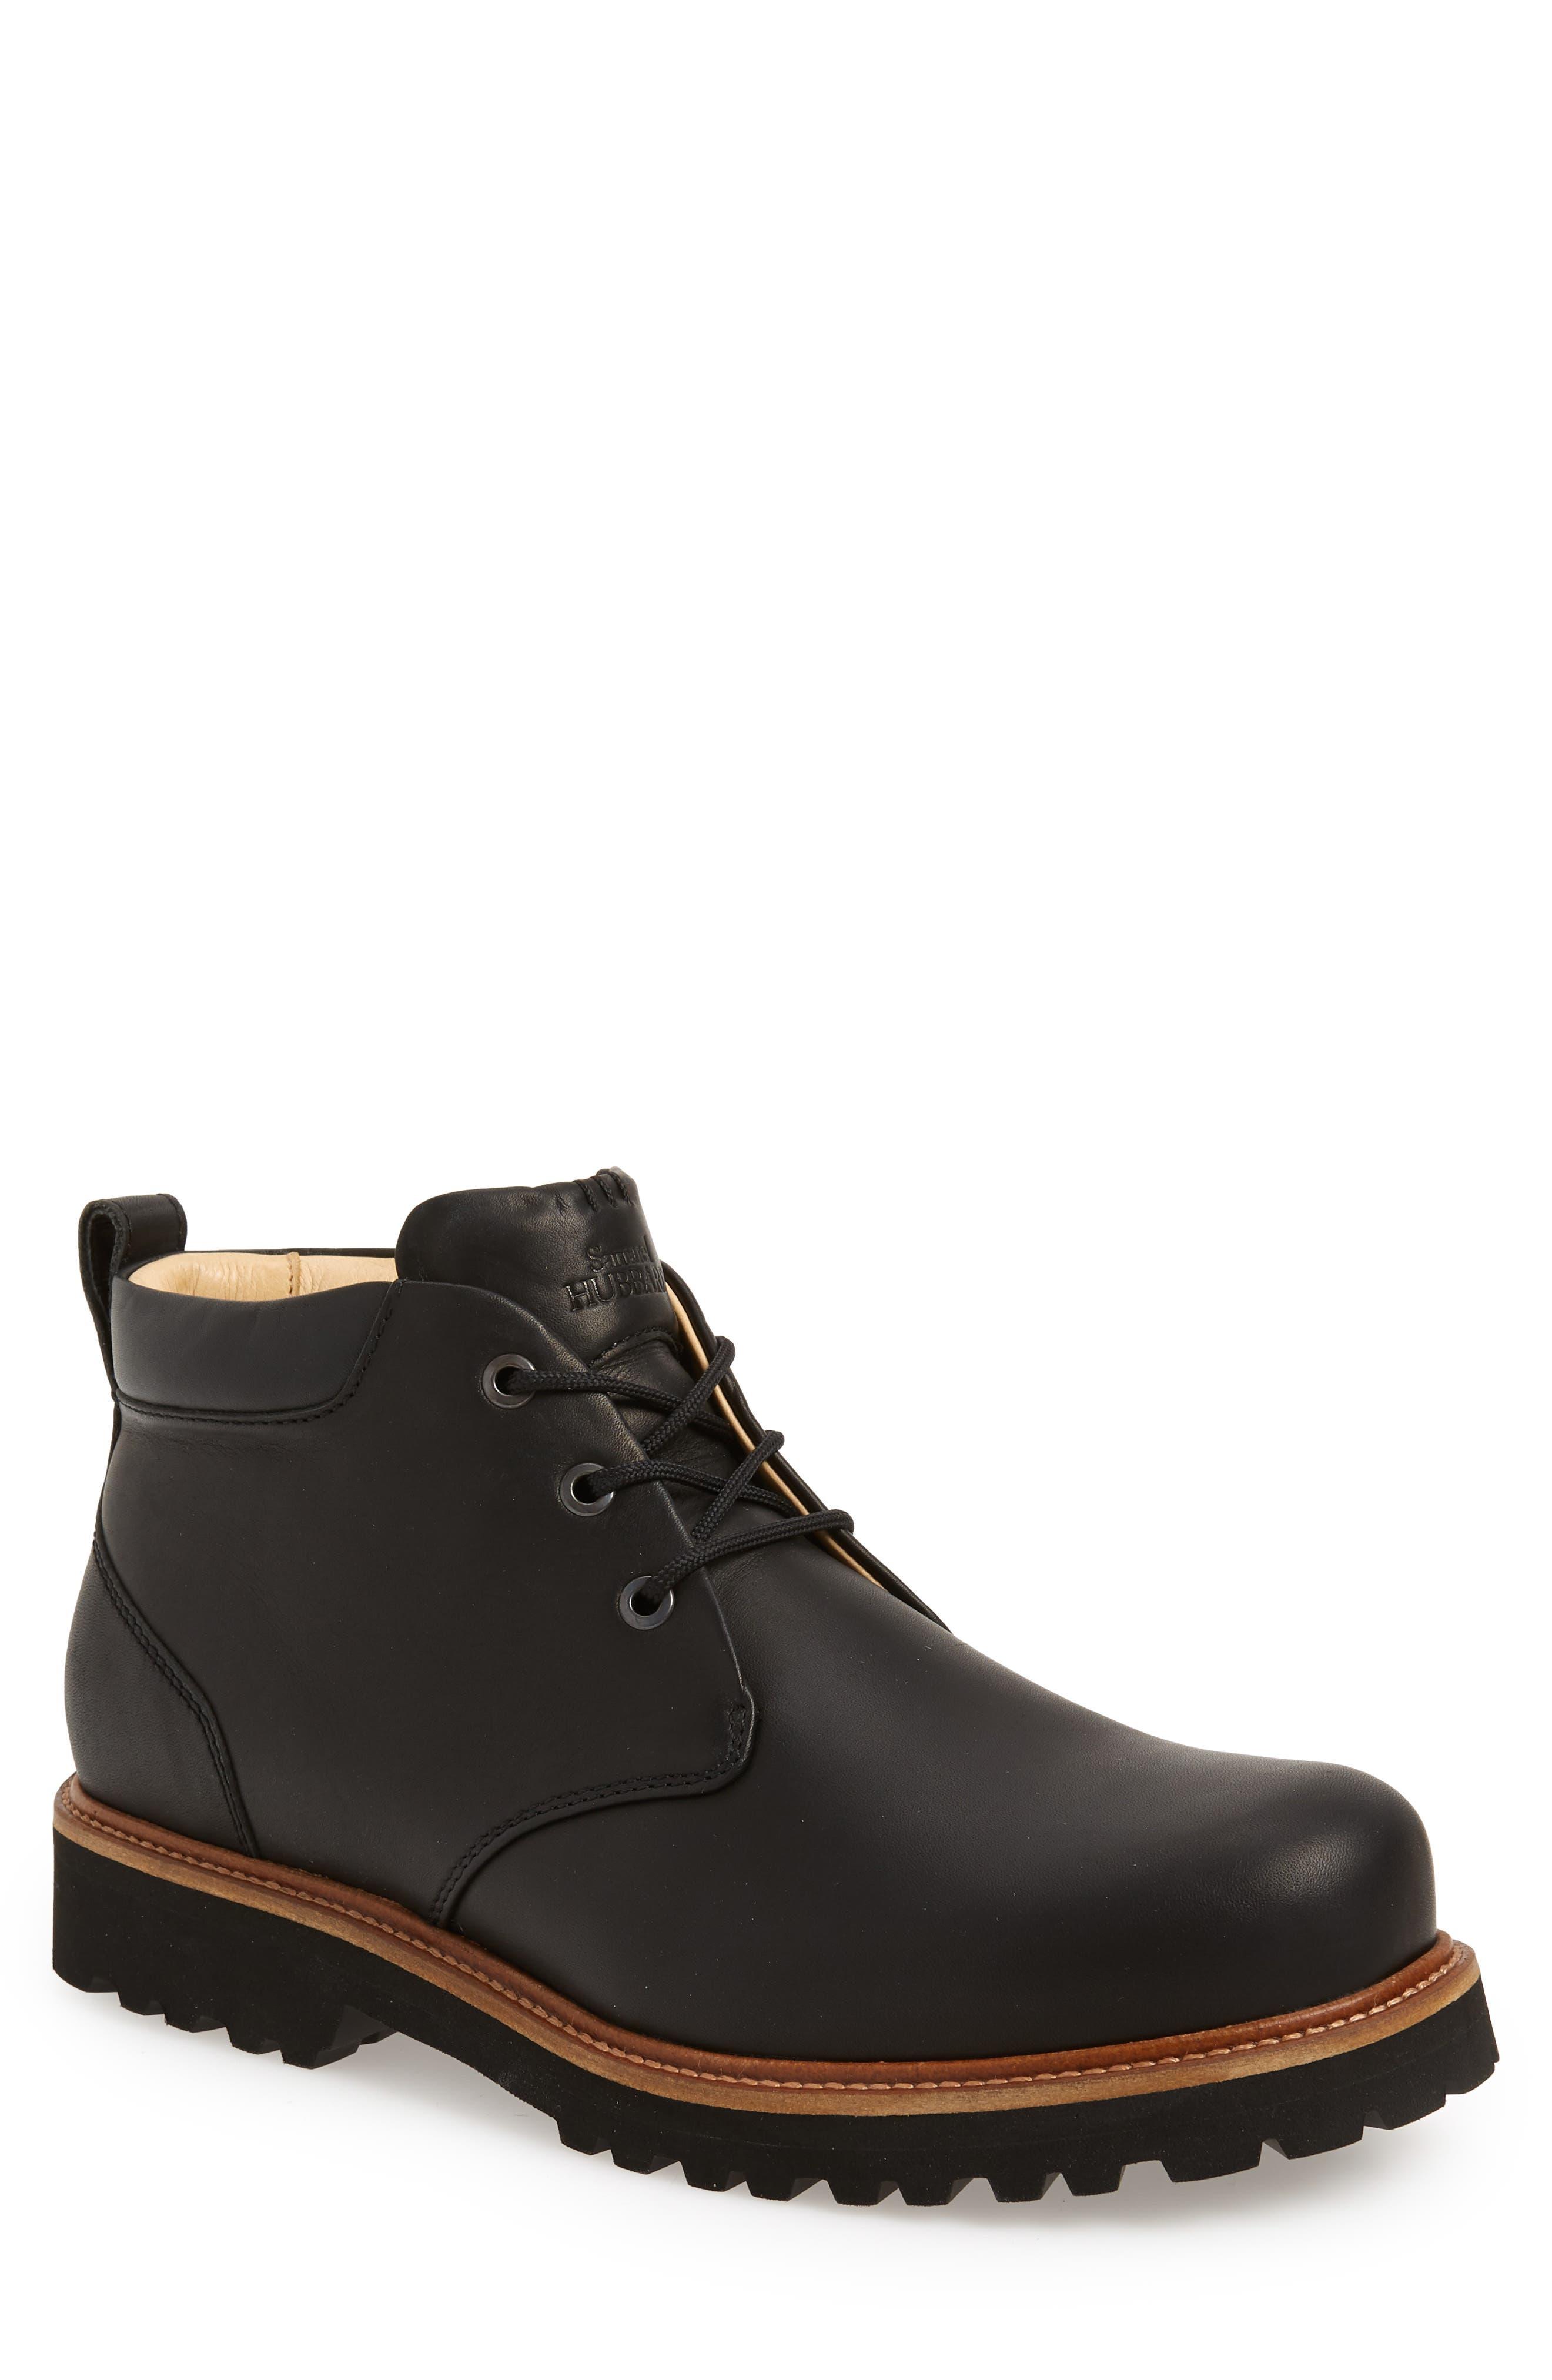 Northcoast Chukka Boot,                         Main,                         color, BLACK LEATHER